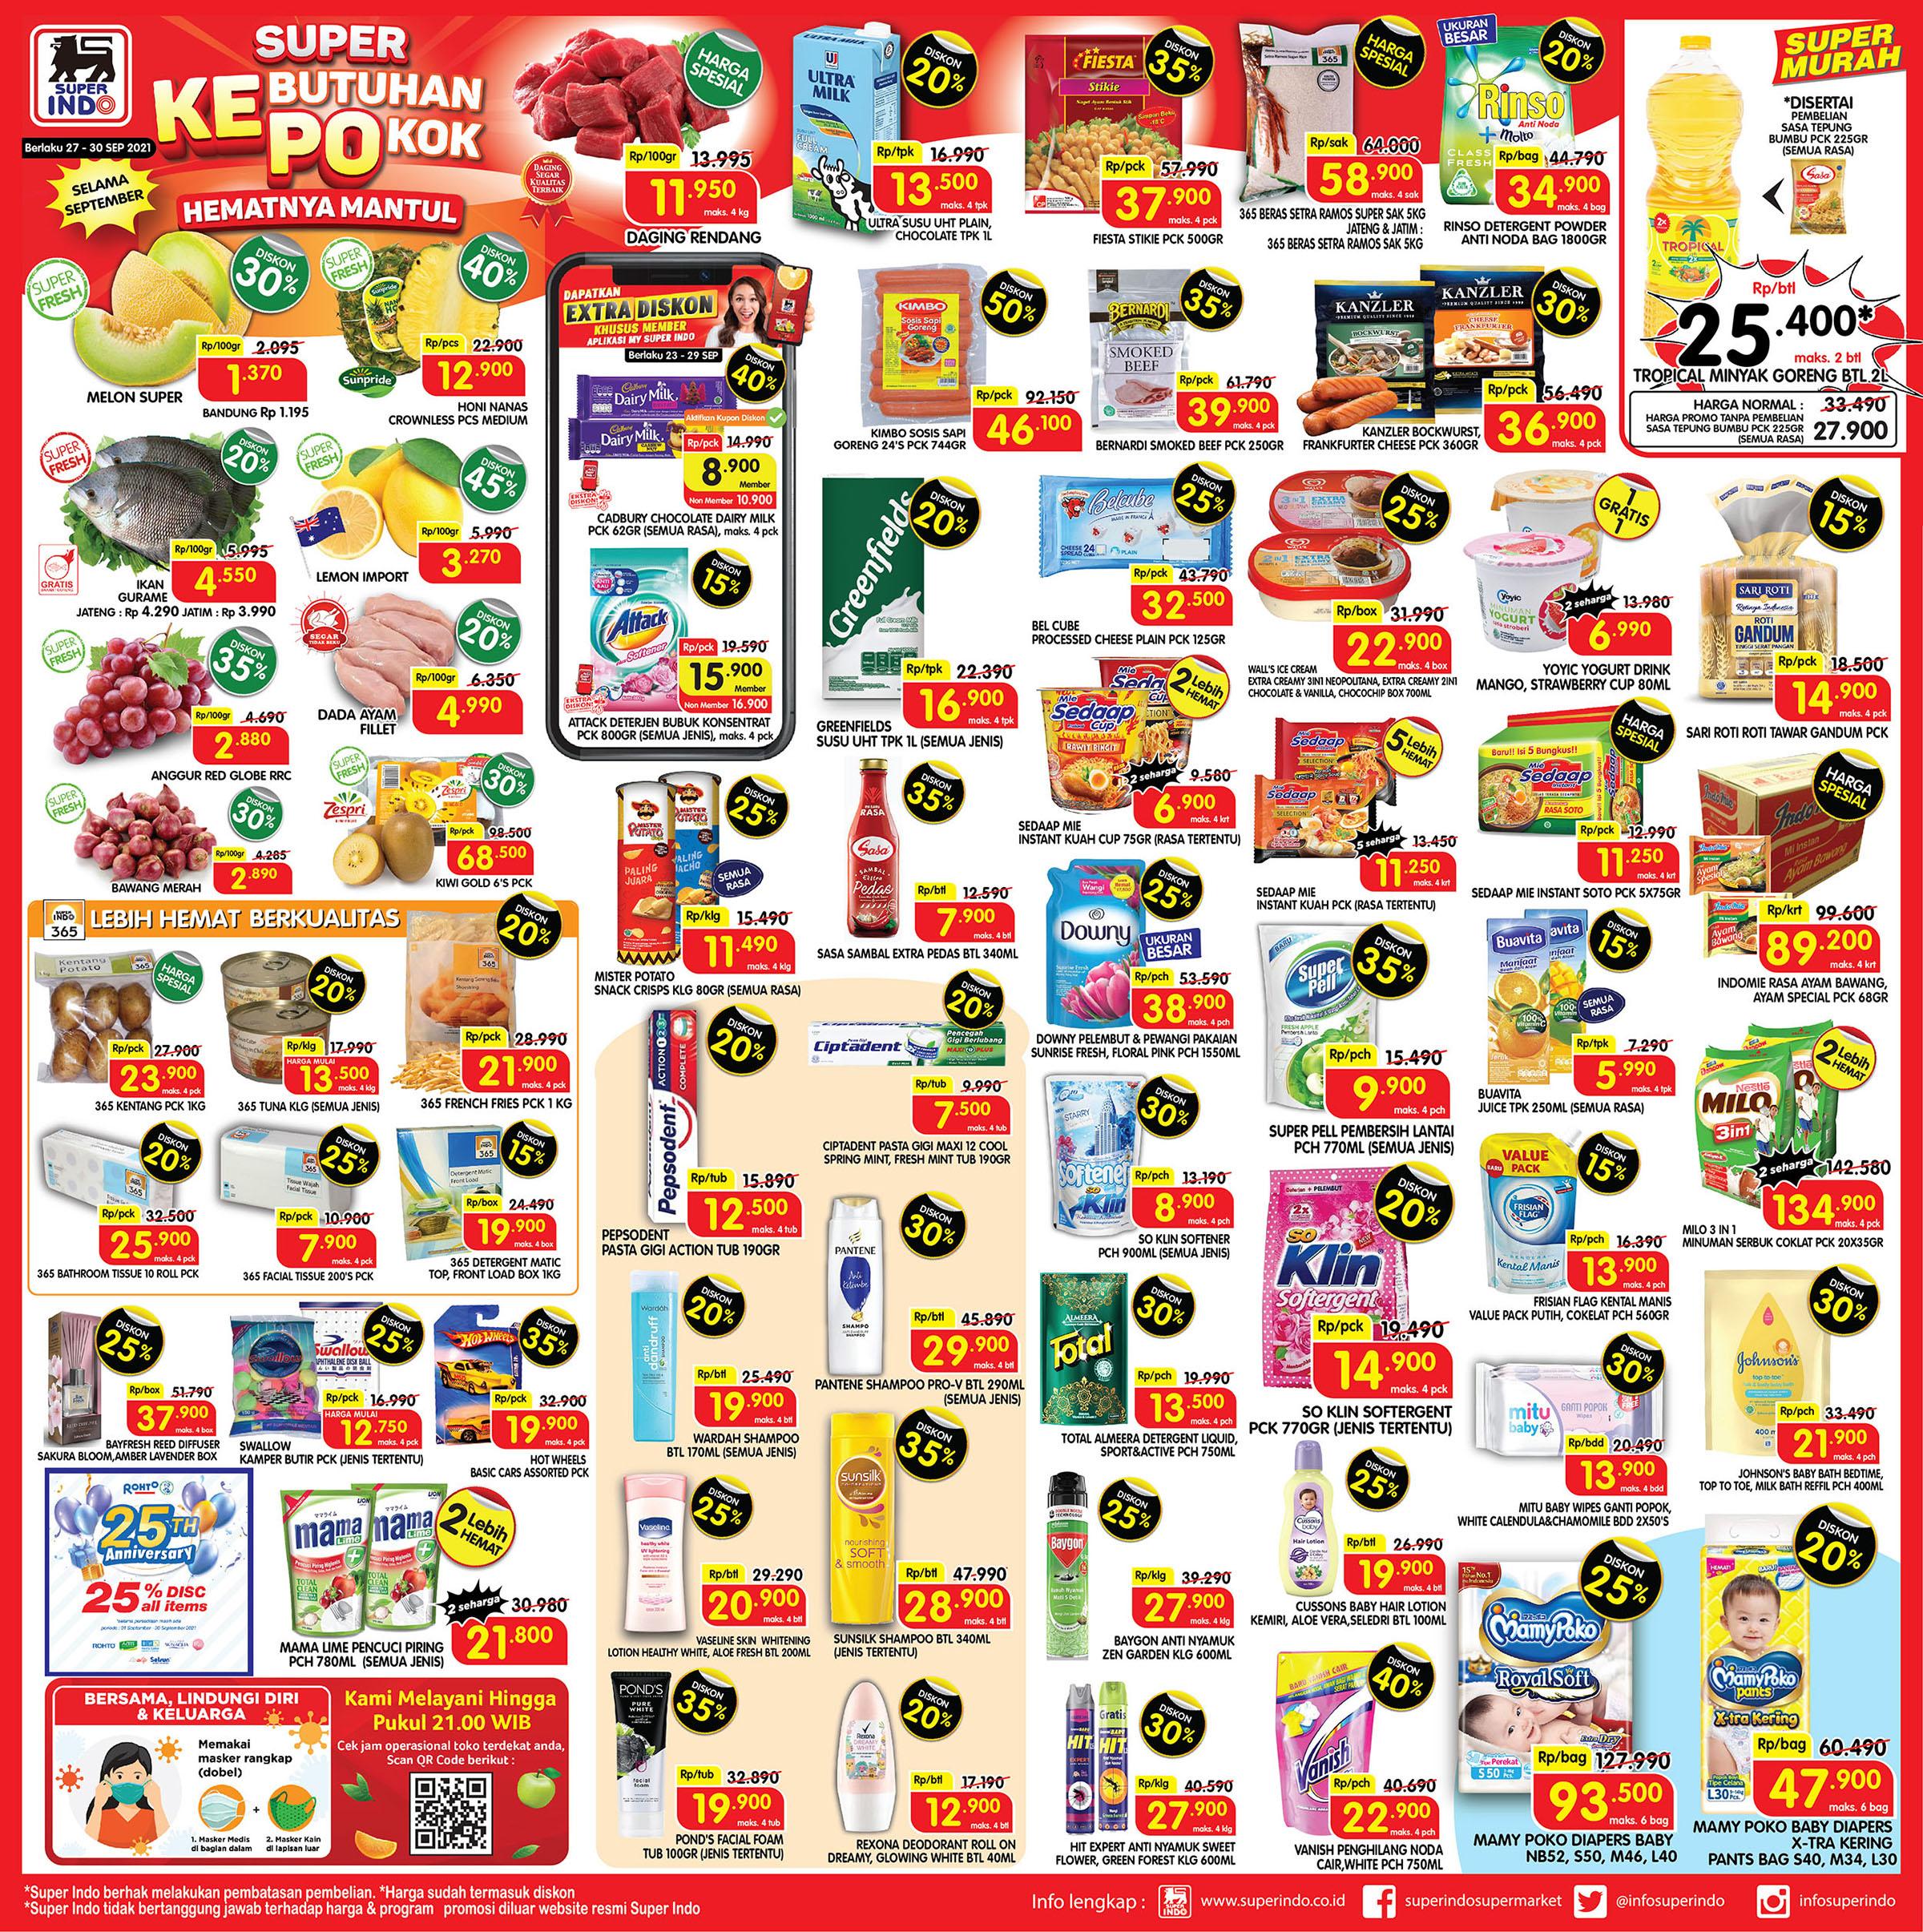 Promo Superindo Katalog Awal Pekan (Weekday) periode 27-30 SEPTEMBER 2021